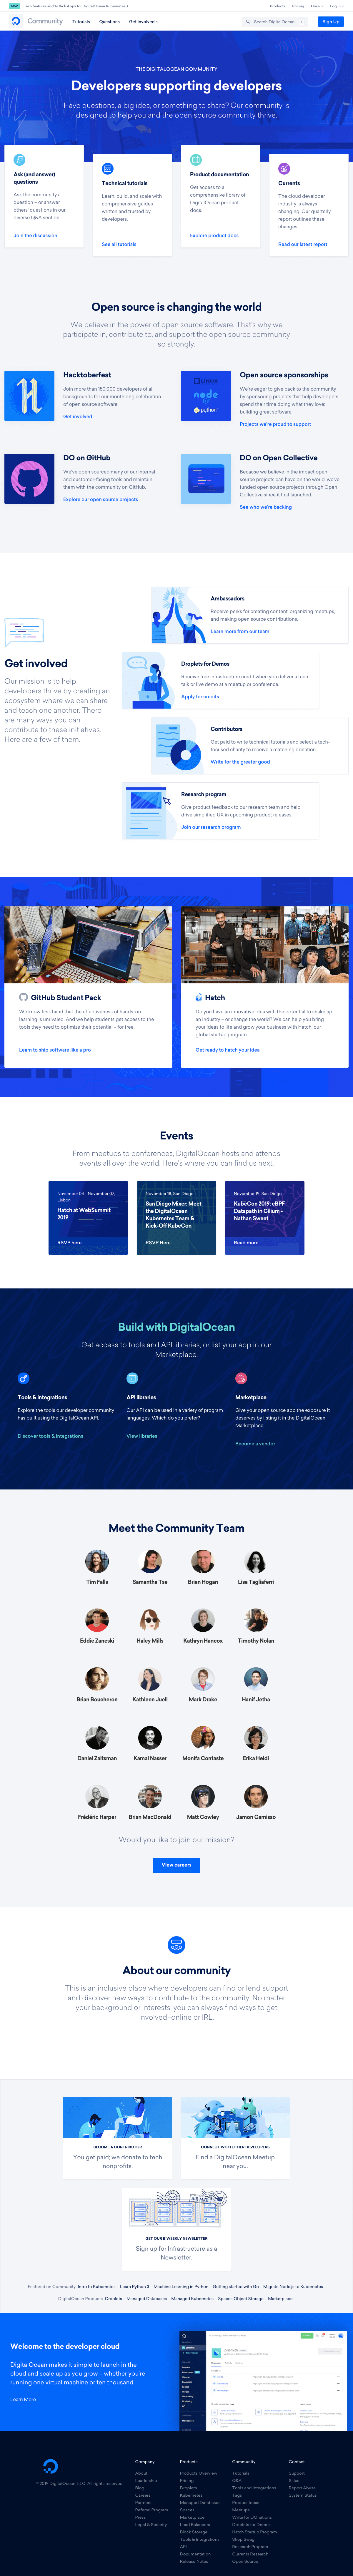 DigitalOcean - Support page